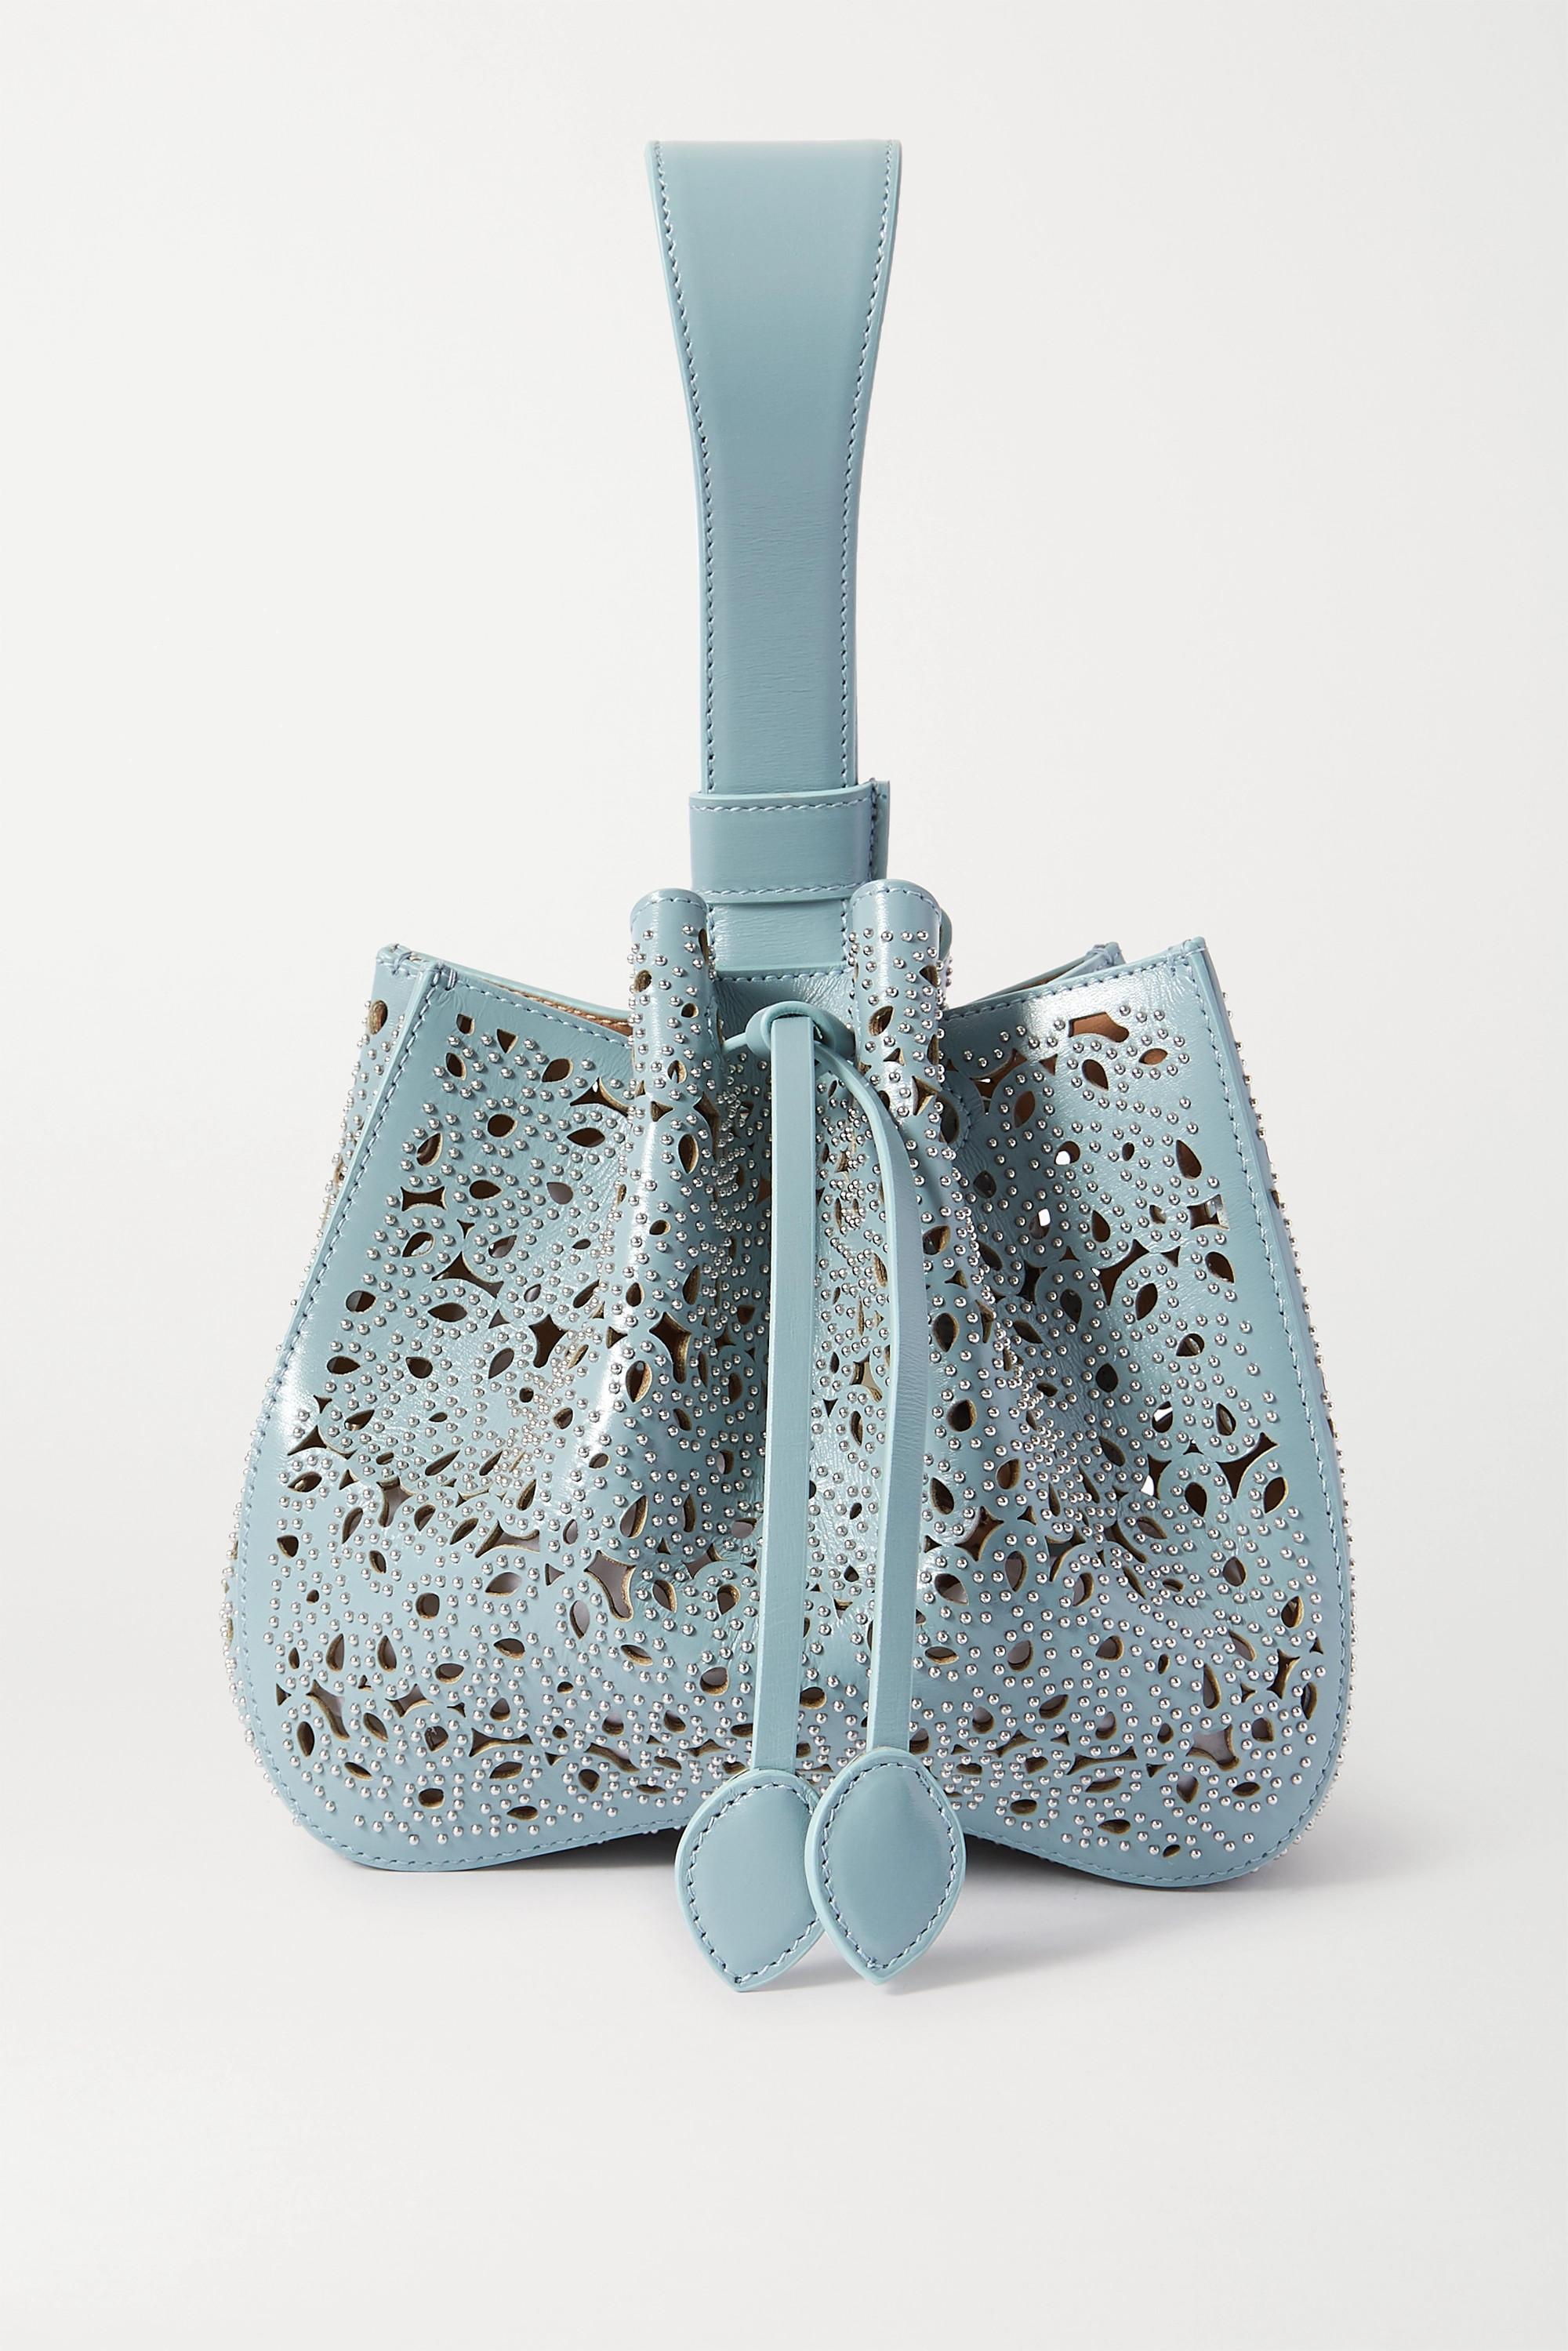 Alaïa Rose Marie small laser-cut leather bucket bag